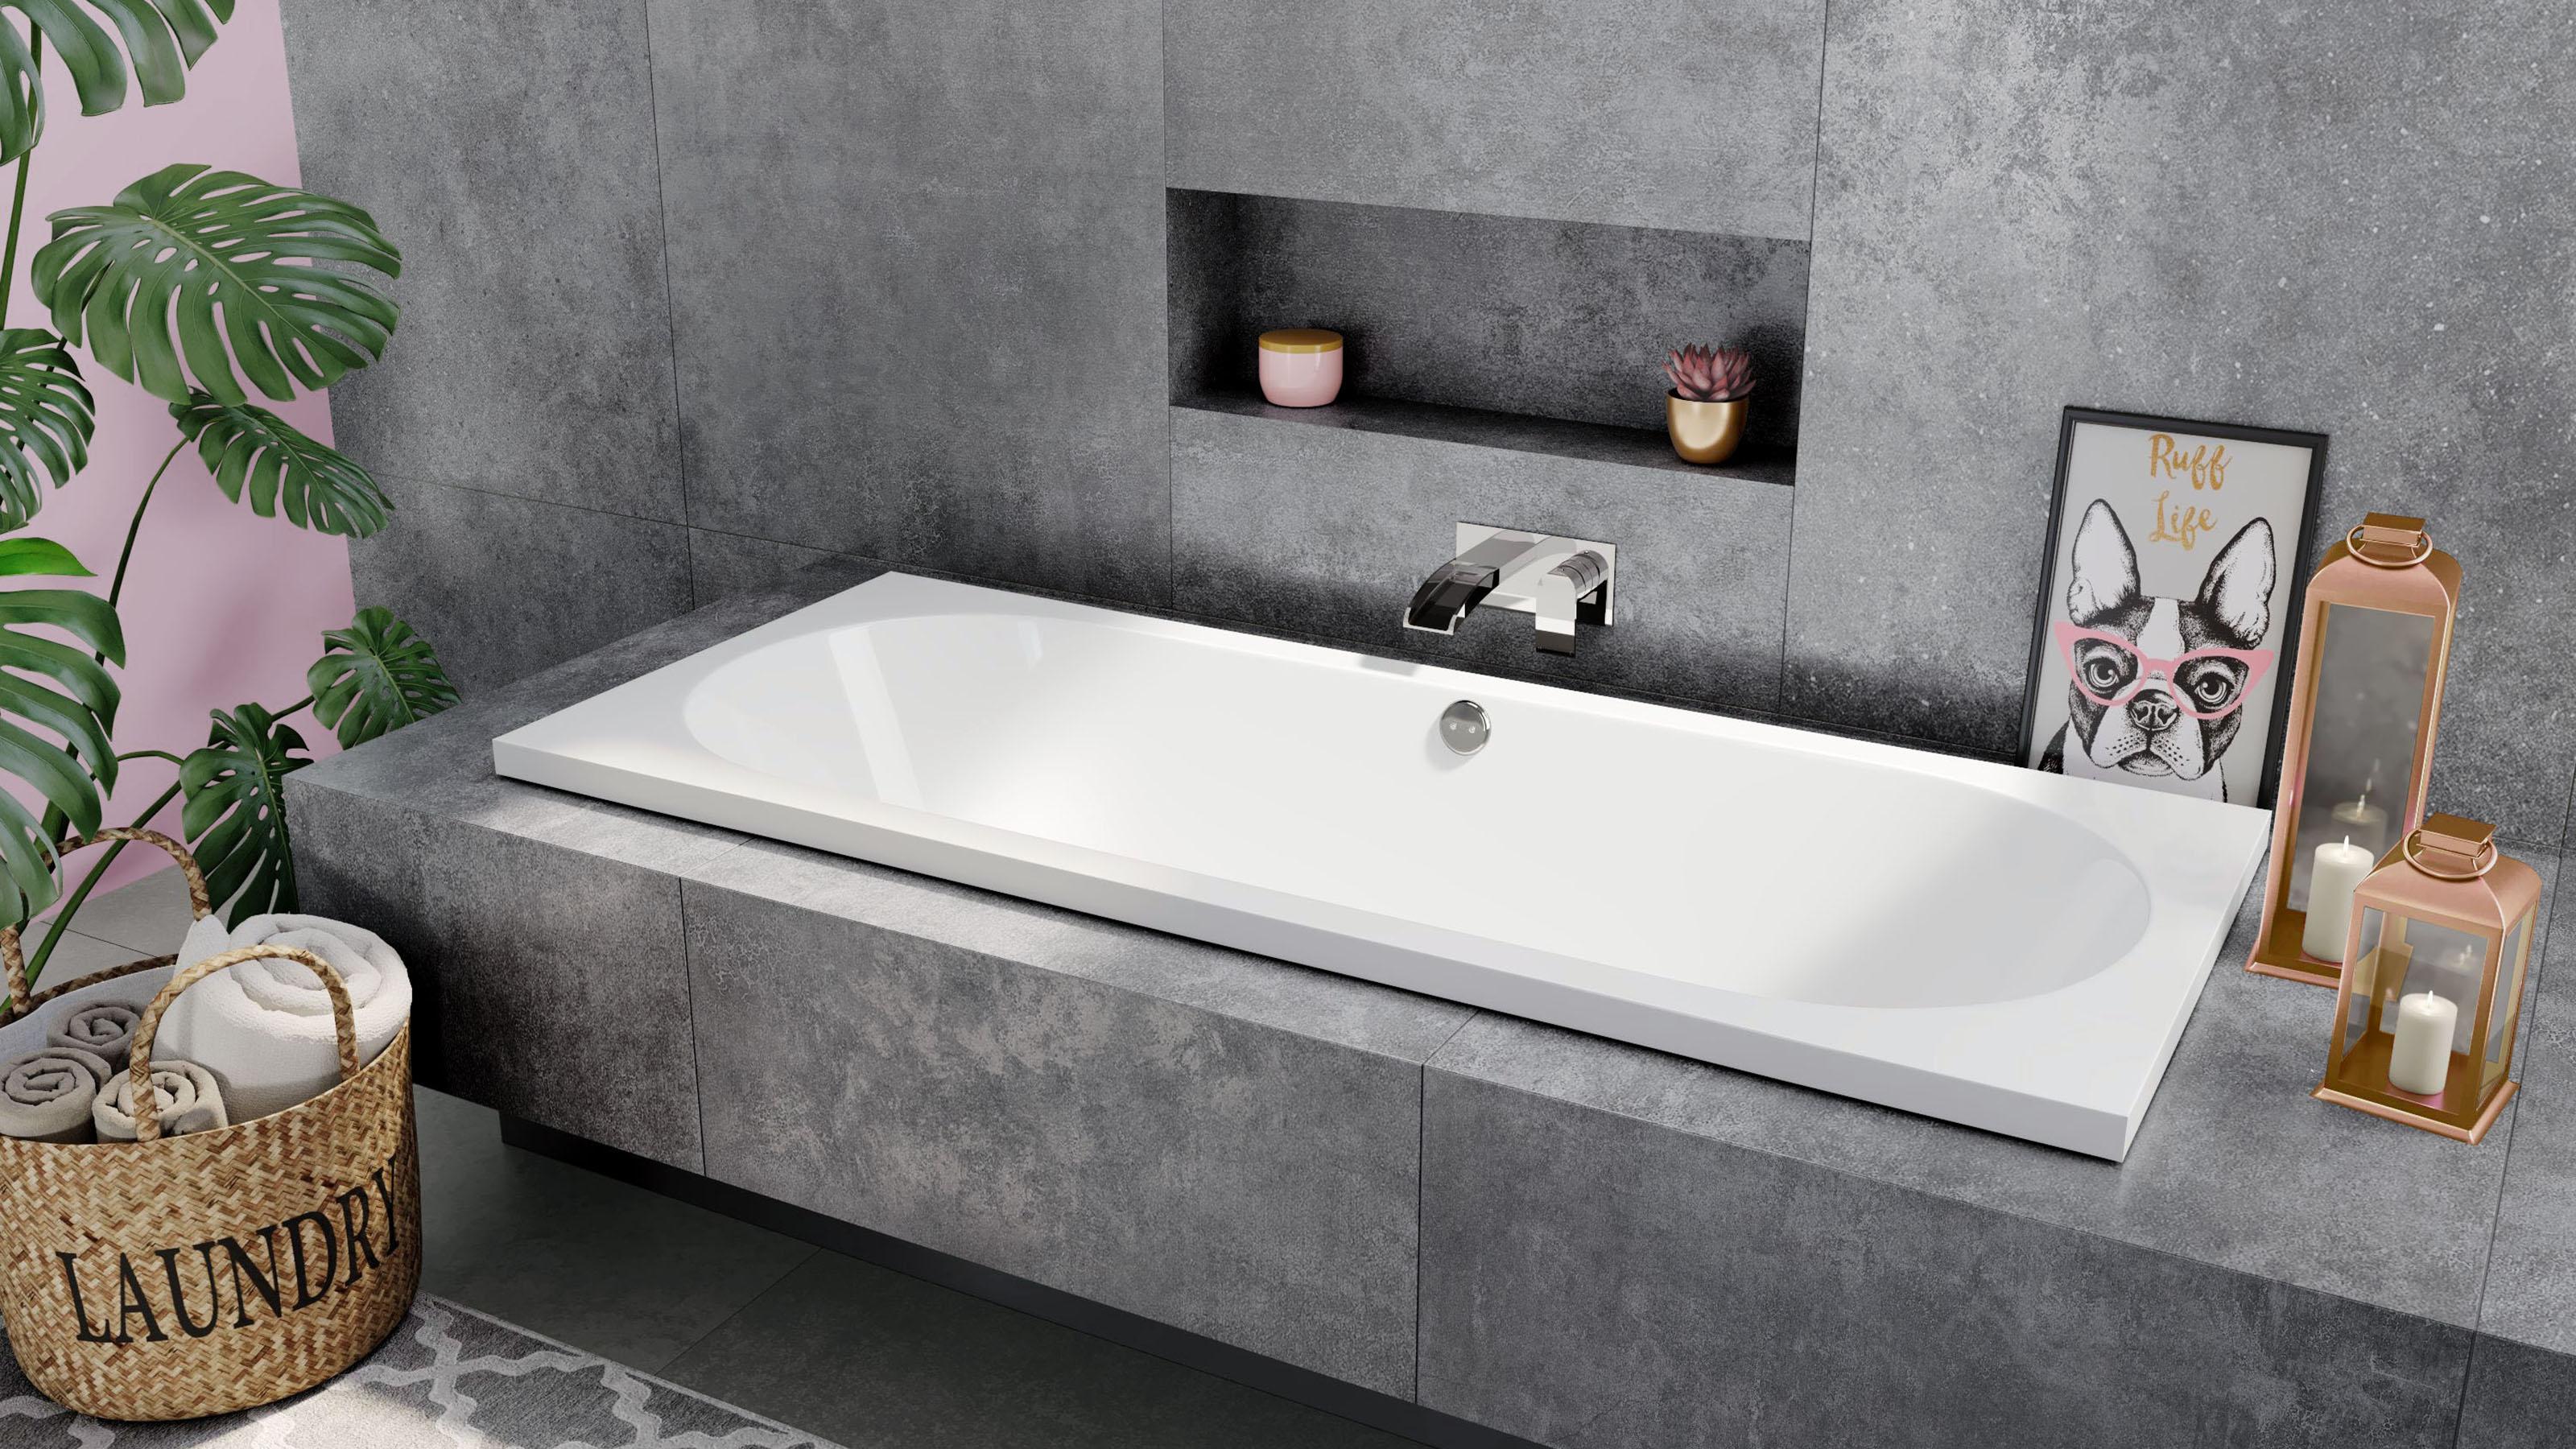 Grey Bathroom Ideas How To Decorate, Bathroom Design Grey